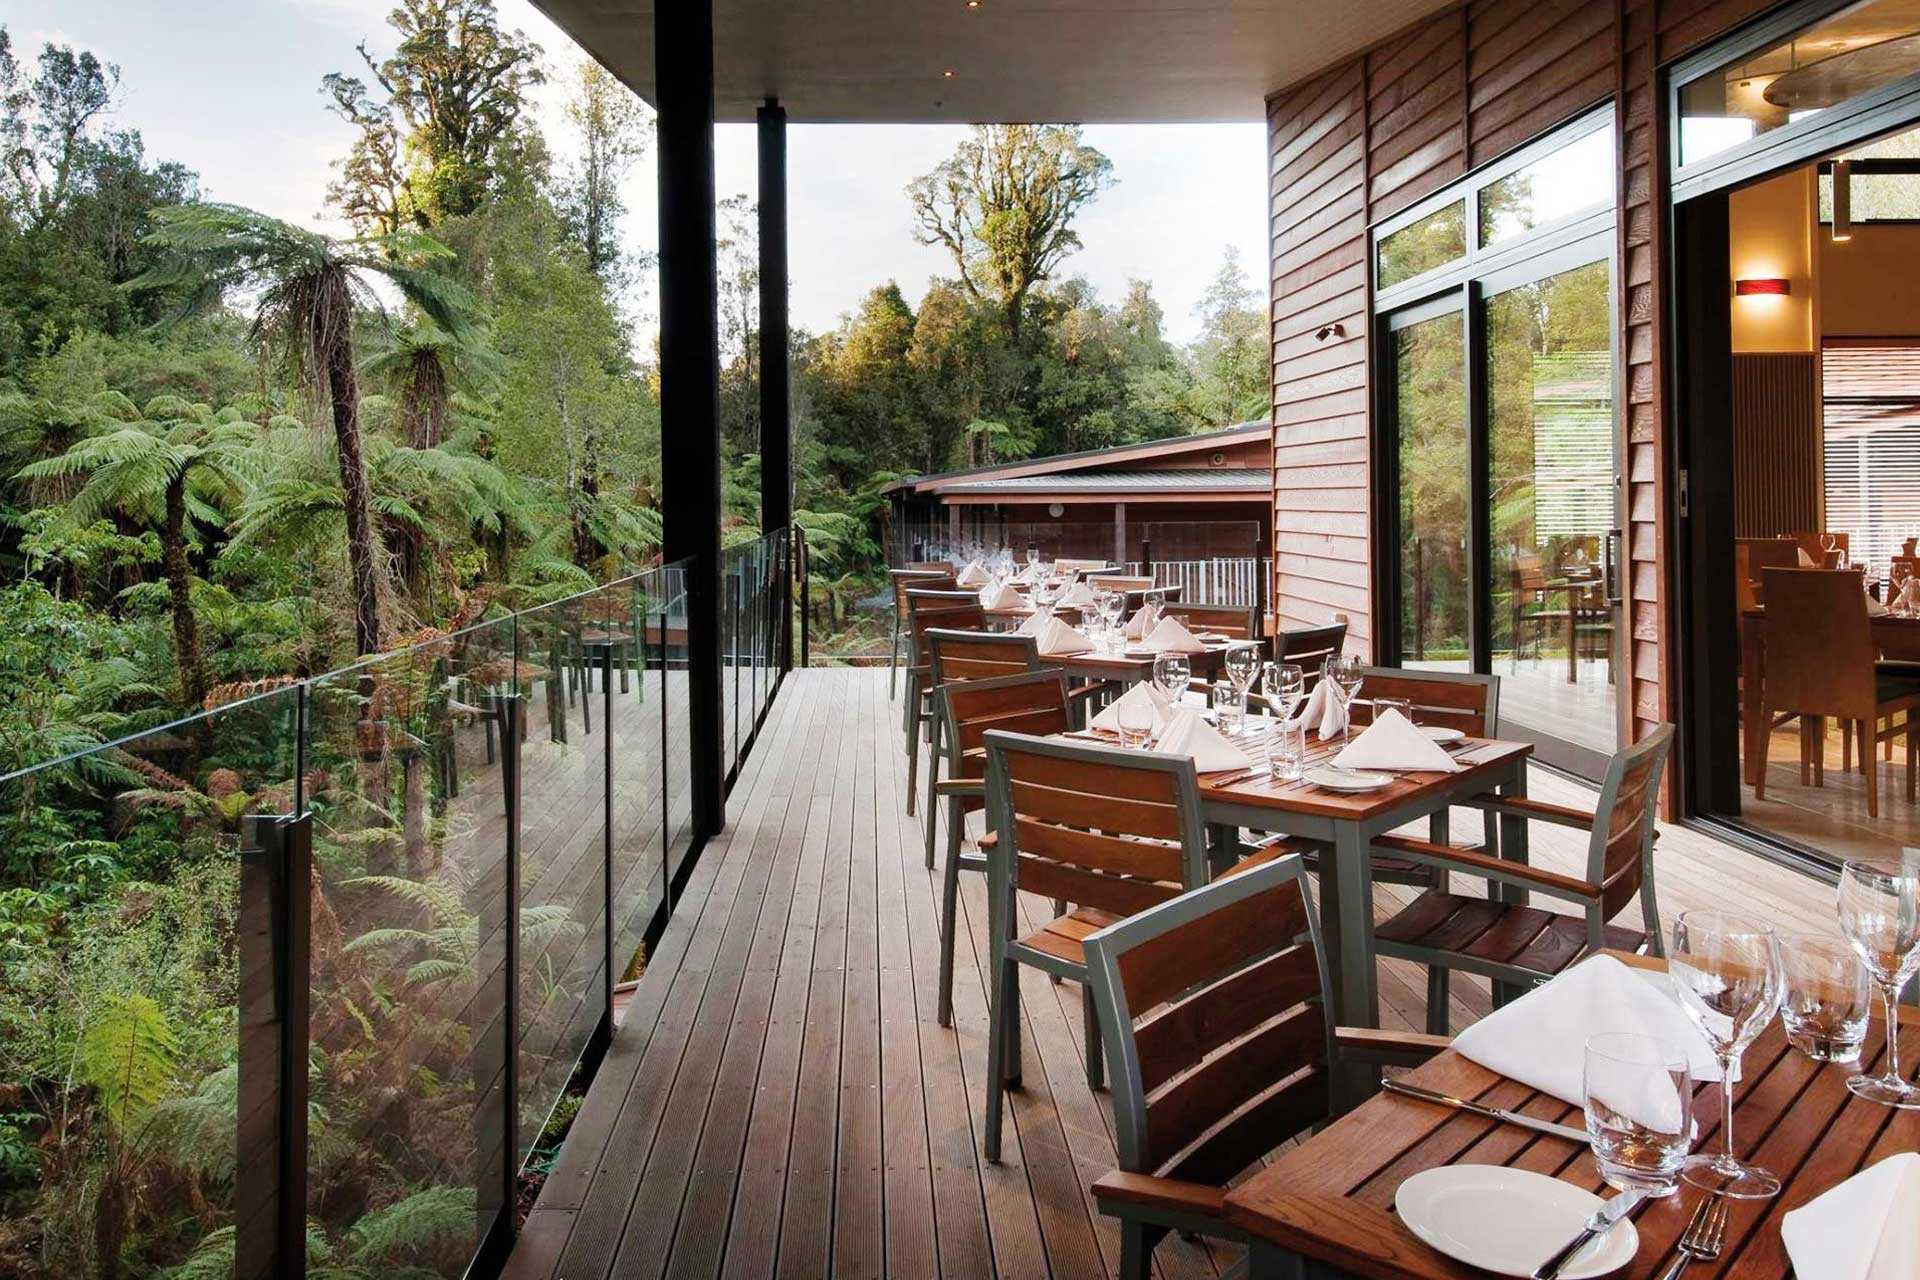 Te Waonui Forest Retreat Restaurant